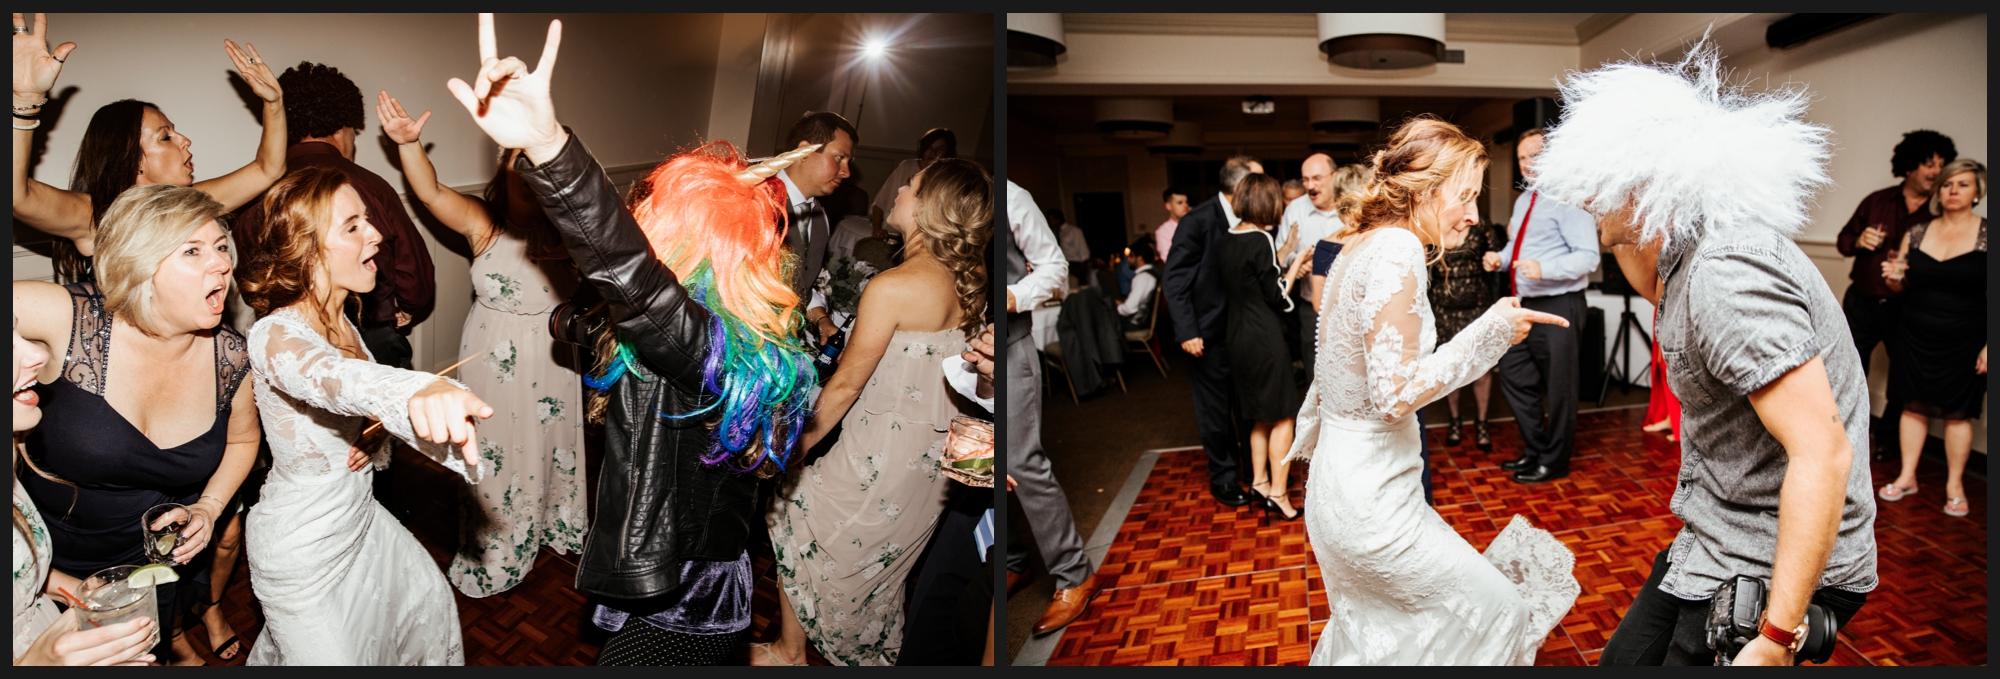 Orlando-Wedding-Photographer-destination-wedding-photographer-florida-wedding-photographer-hawaii-wedding-photographer_0113.jpg